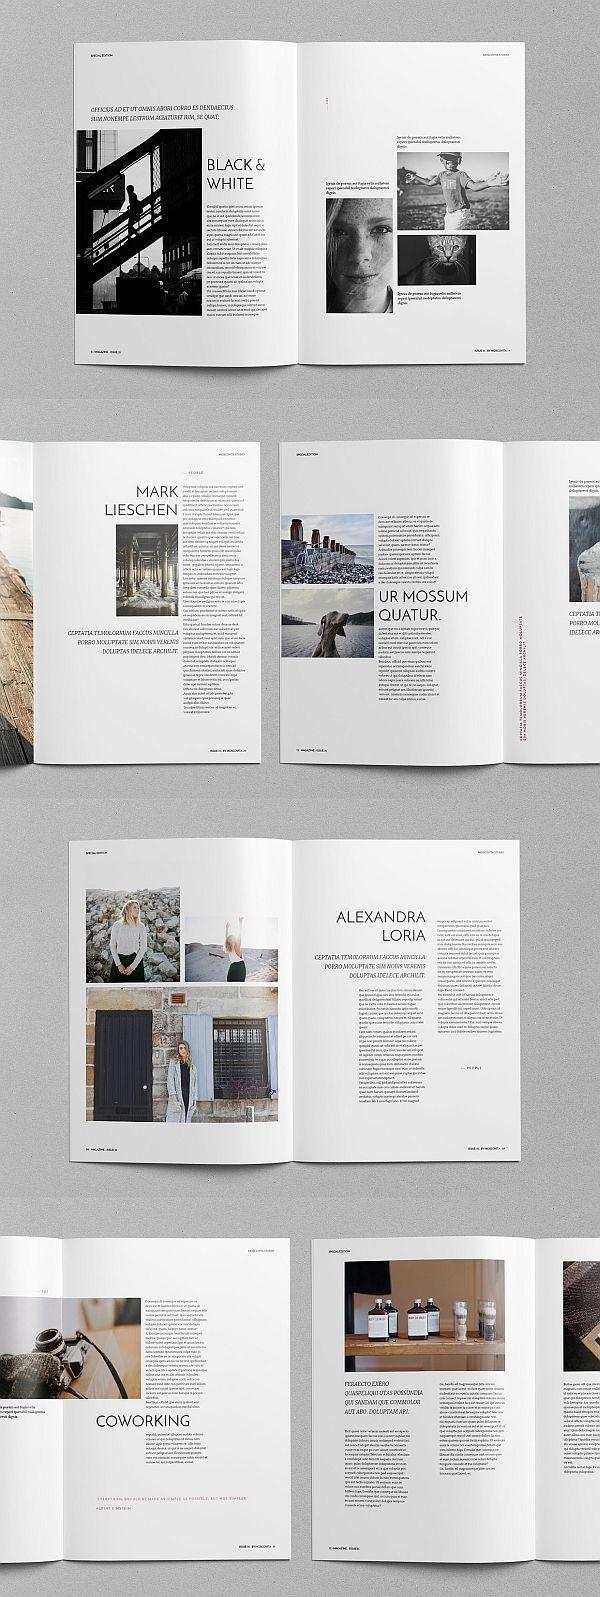 Eko Magazine Template #magazine #broschüre #broschüre #broschüre #broschüre